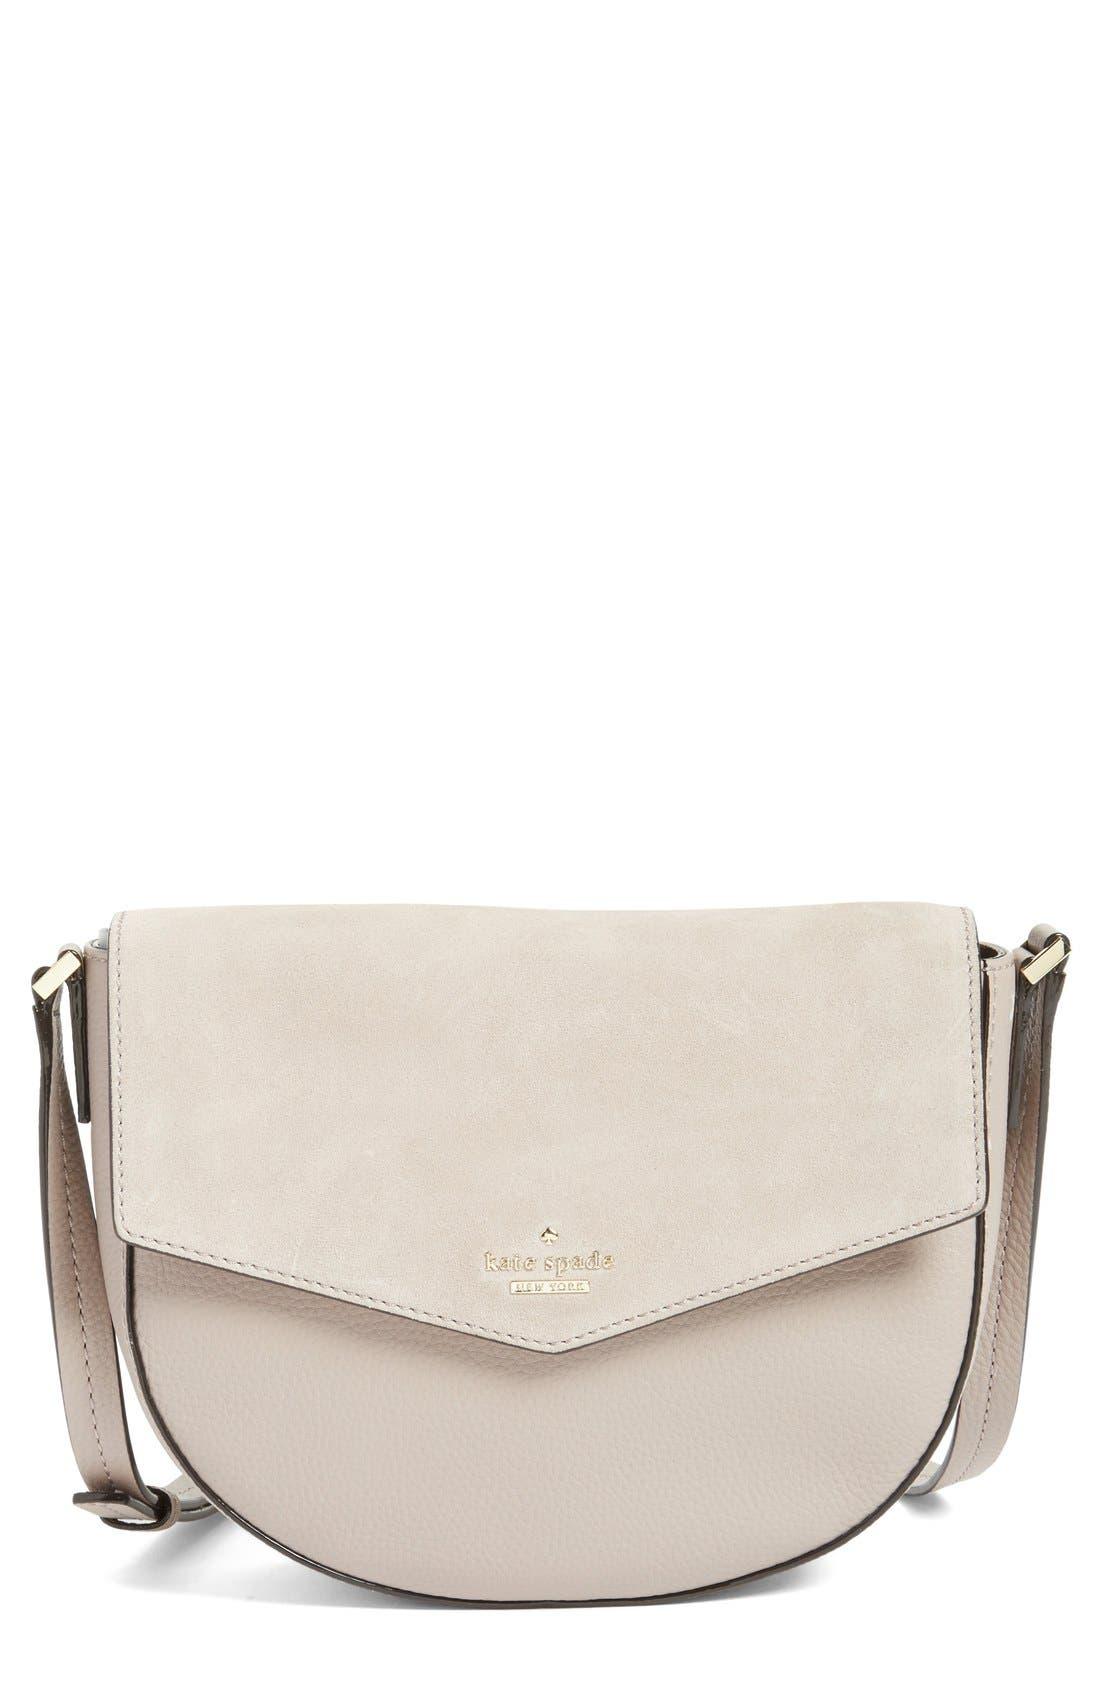 Main Image - kate spade new york 'spencer court - lavinia' leather & suede crossbody bag